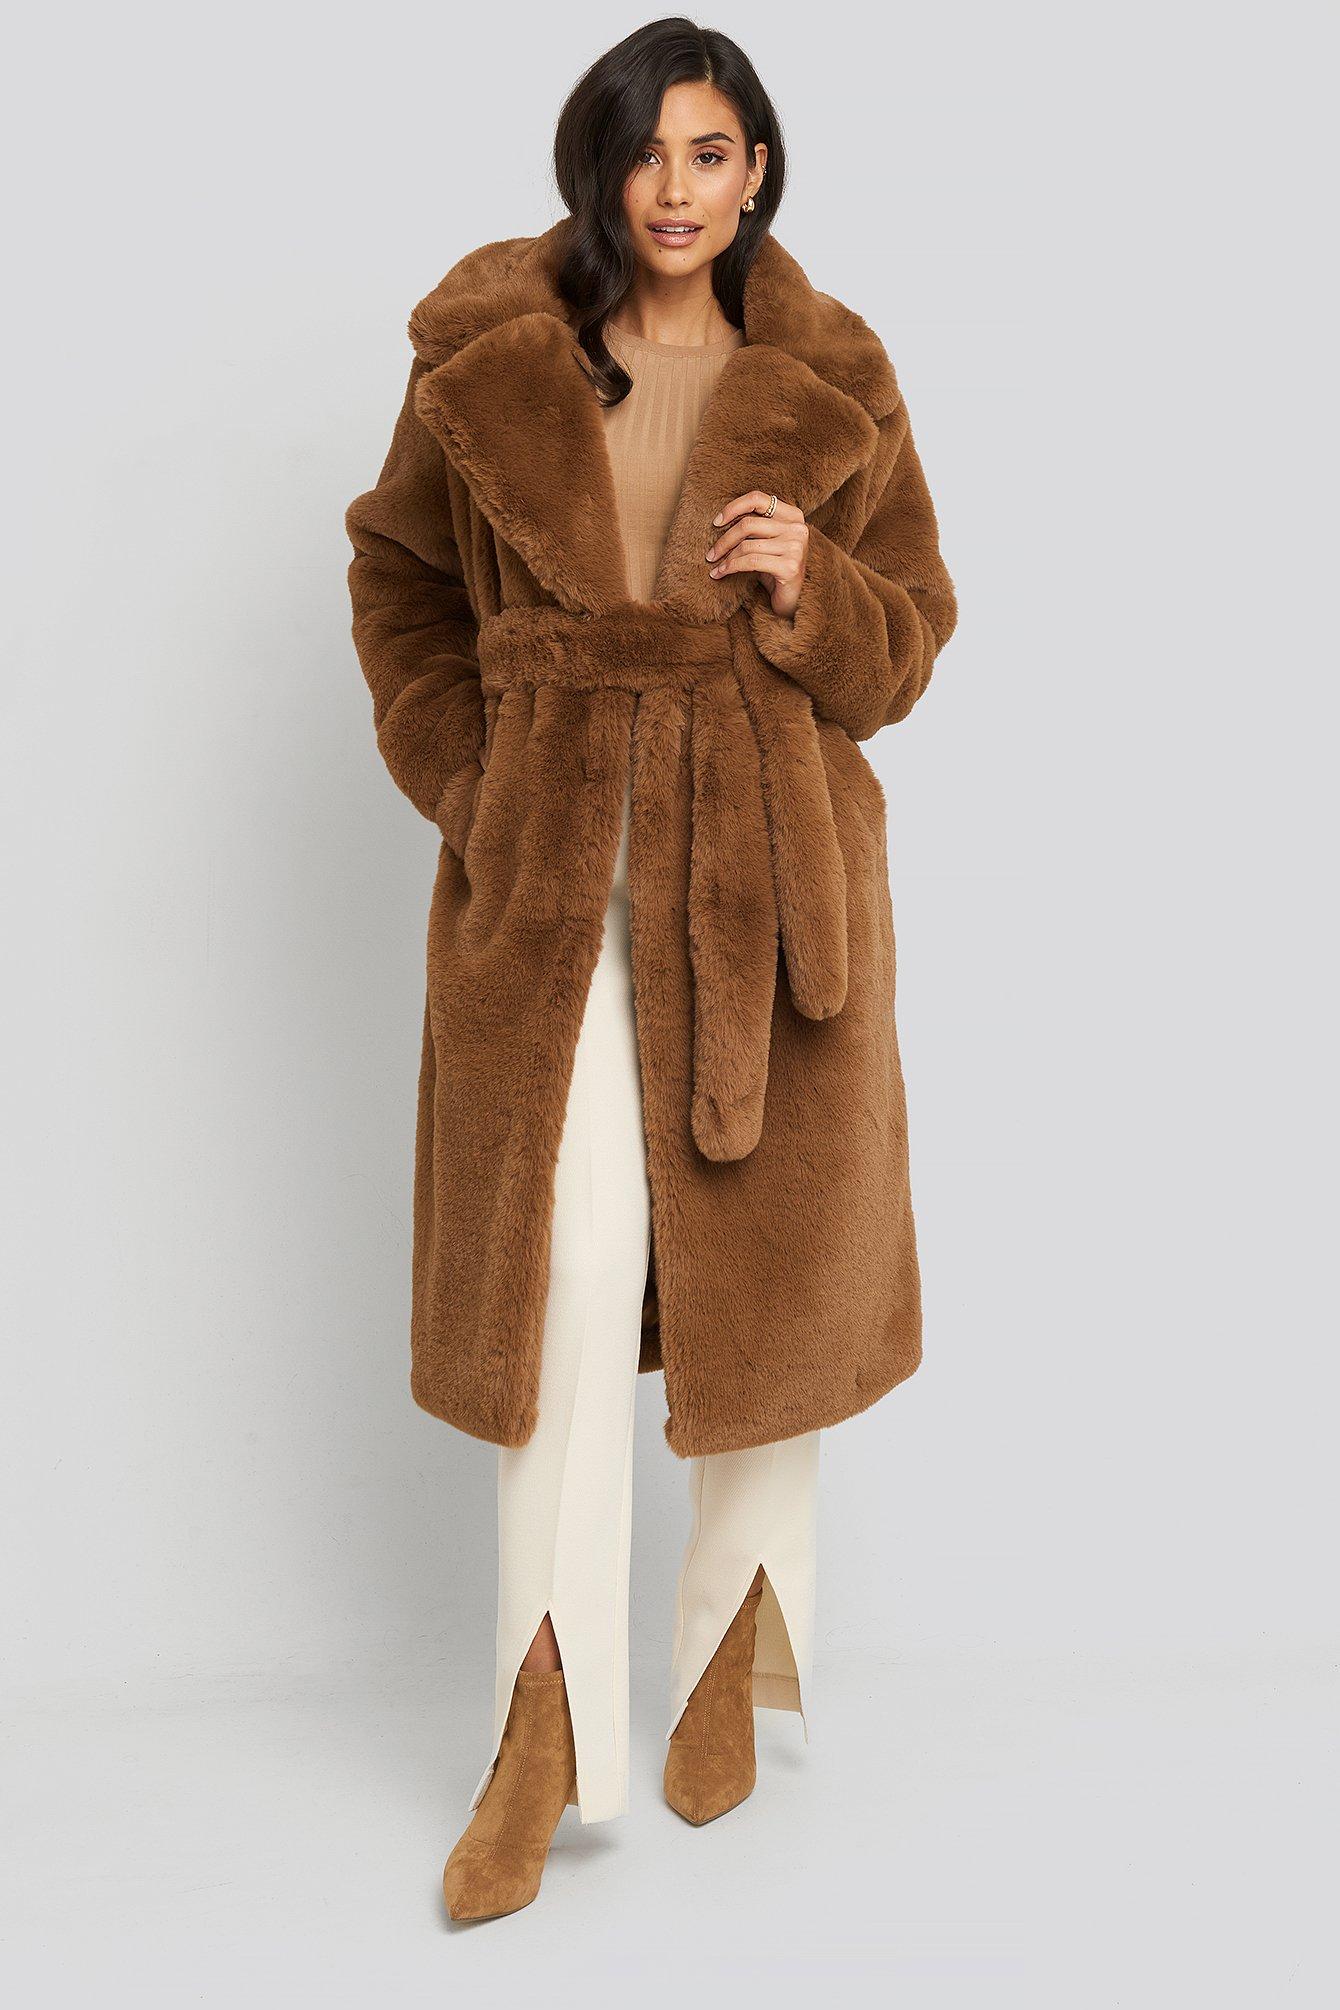 Soft Faux Fur Long Coat Marron by Na Kd Trend